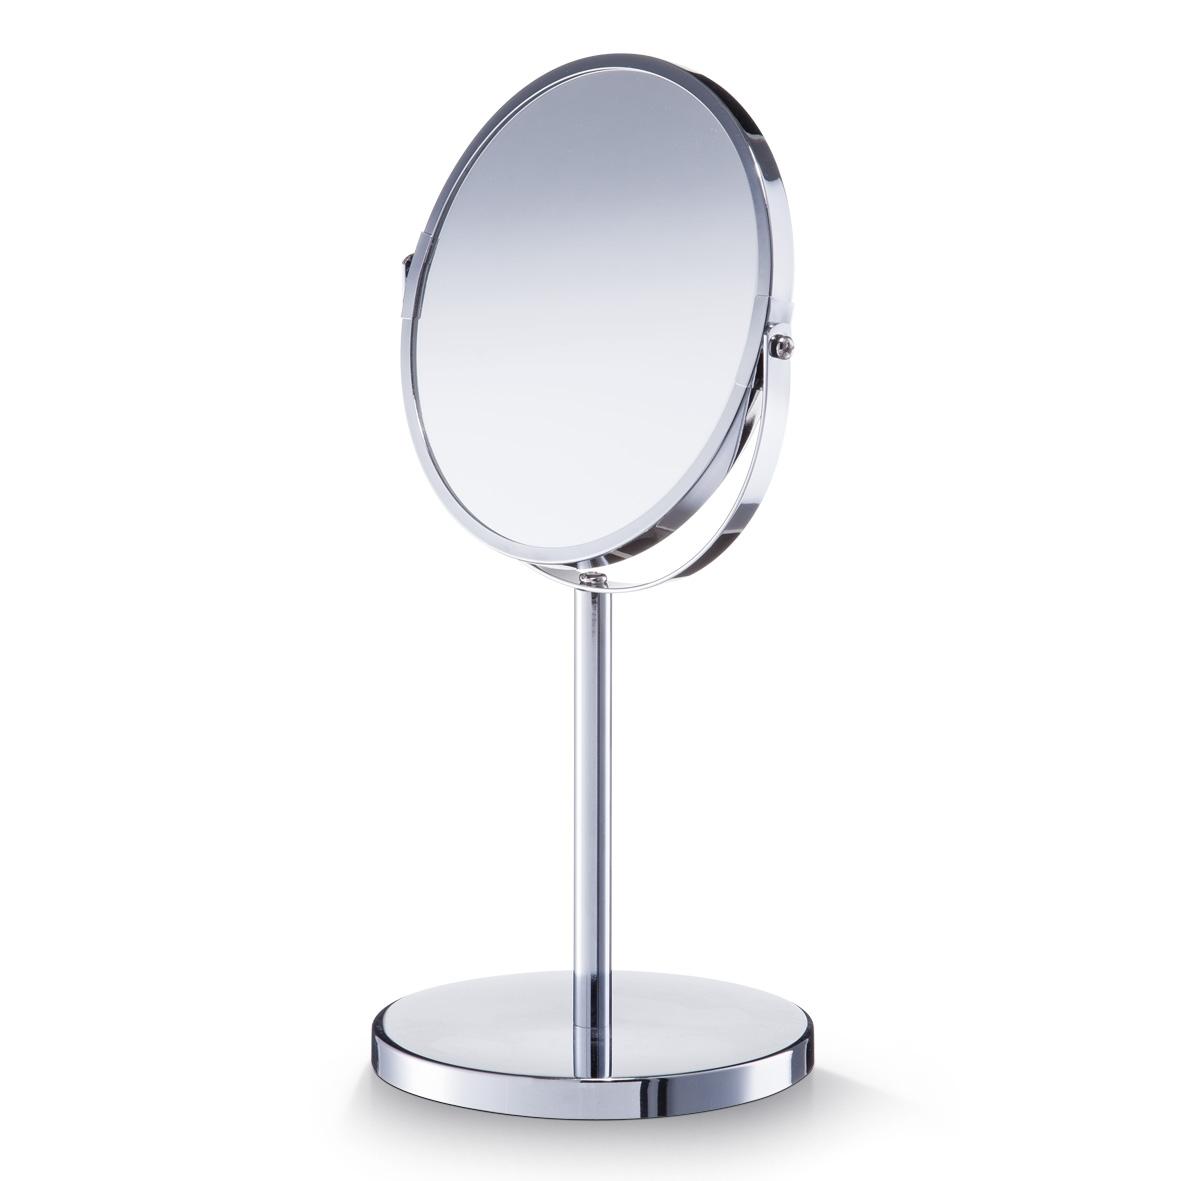 Oglinda cosmetica de masa, Metal Cromat, Ø 15xH35 cm somproduct.ro